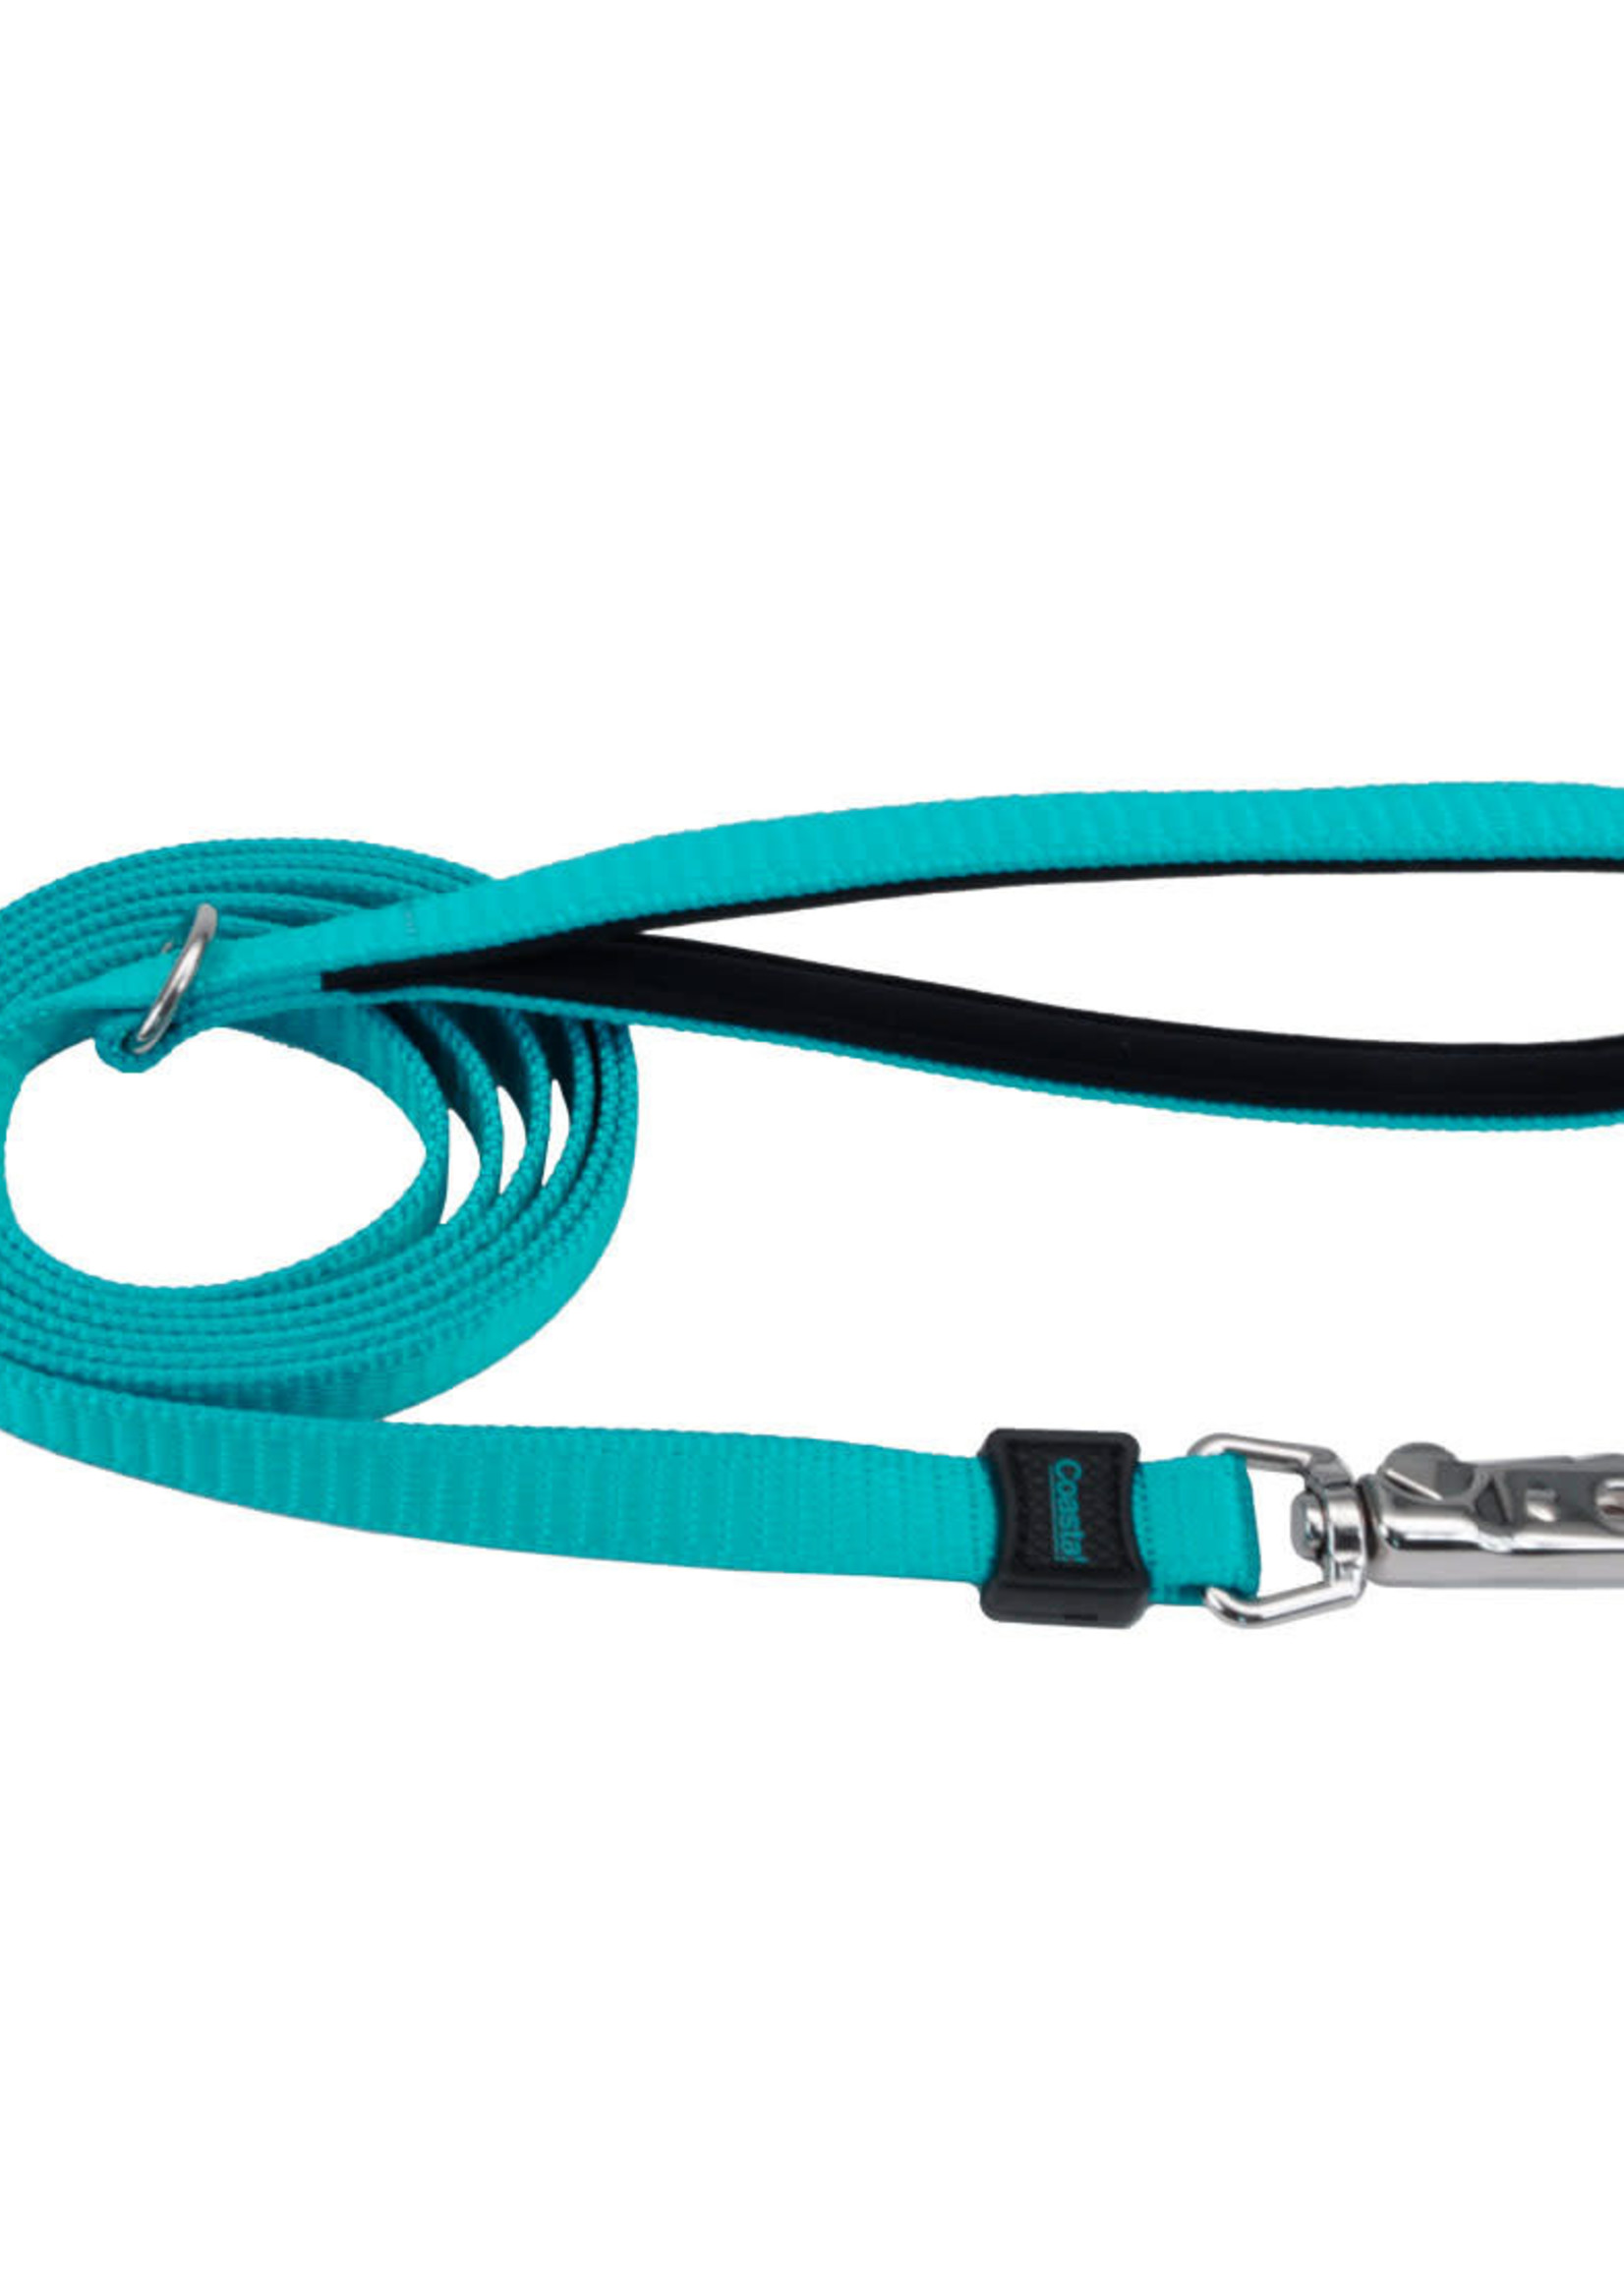 "Coastal® Inspire Neoprene Leash  1""x6' Aqua"